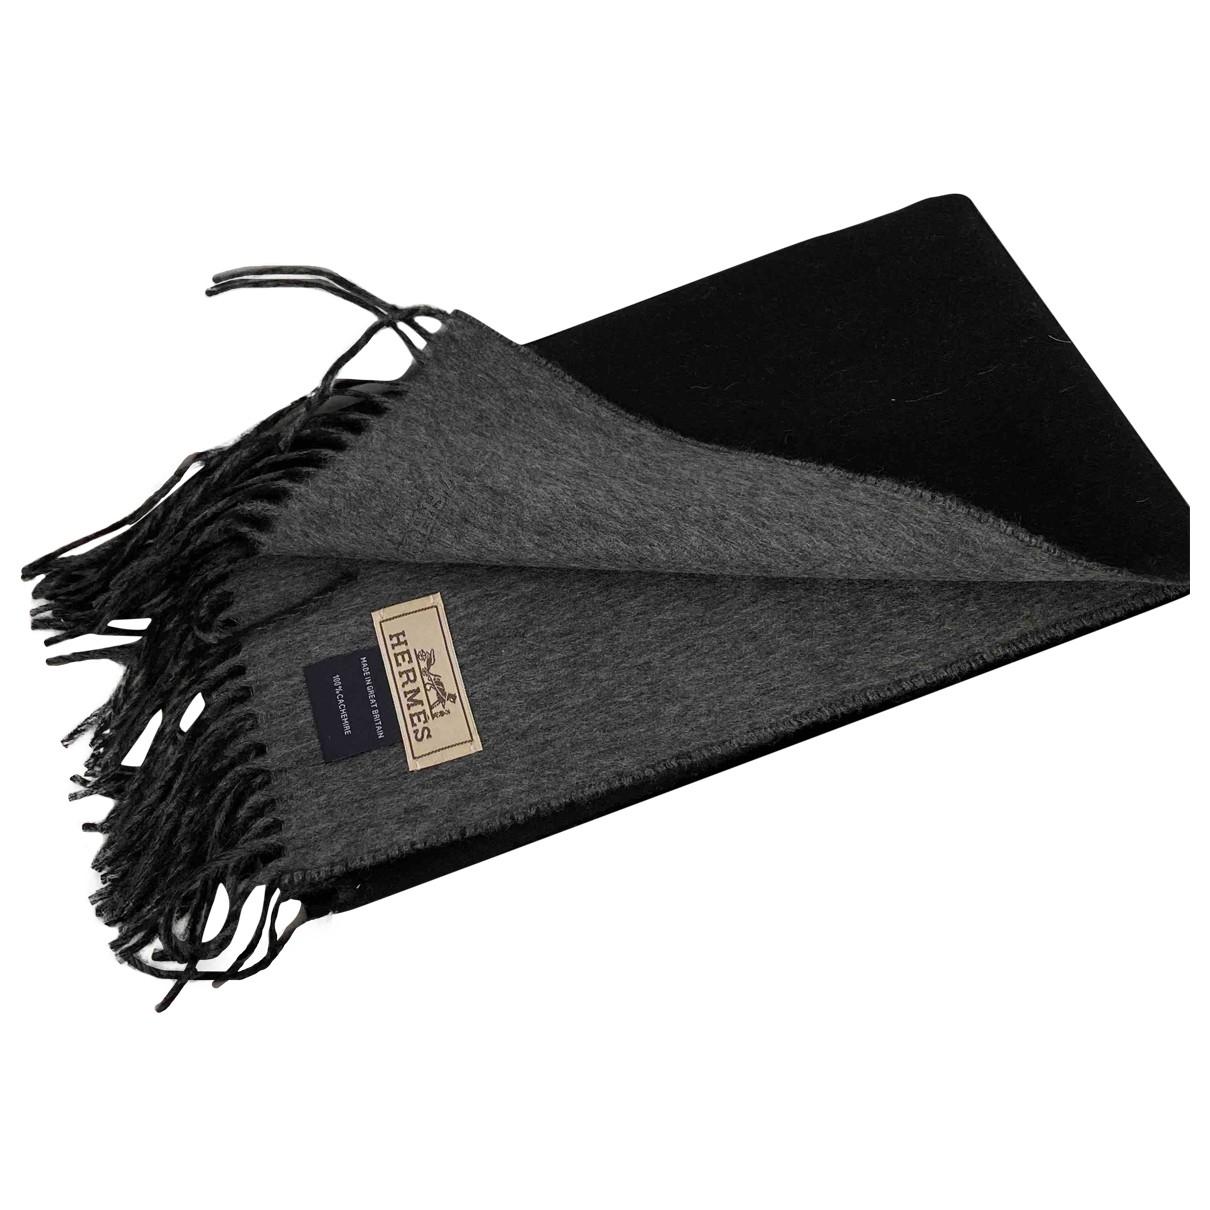 Hermès \N Anthracite Cashmere scarf for Women \N